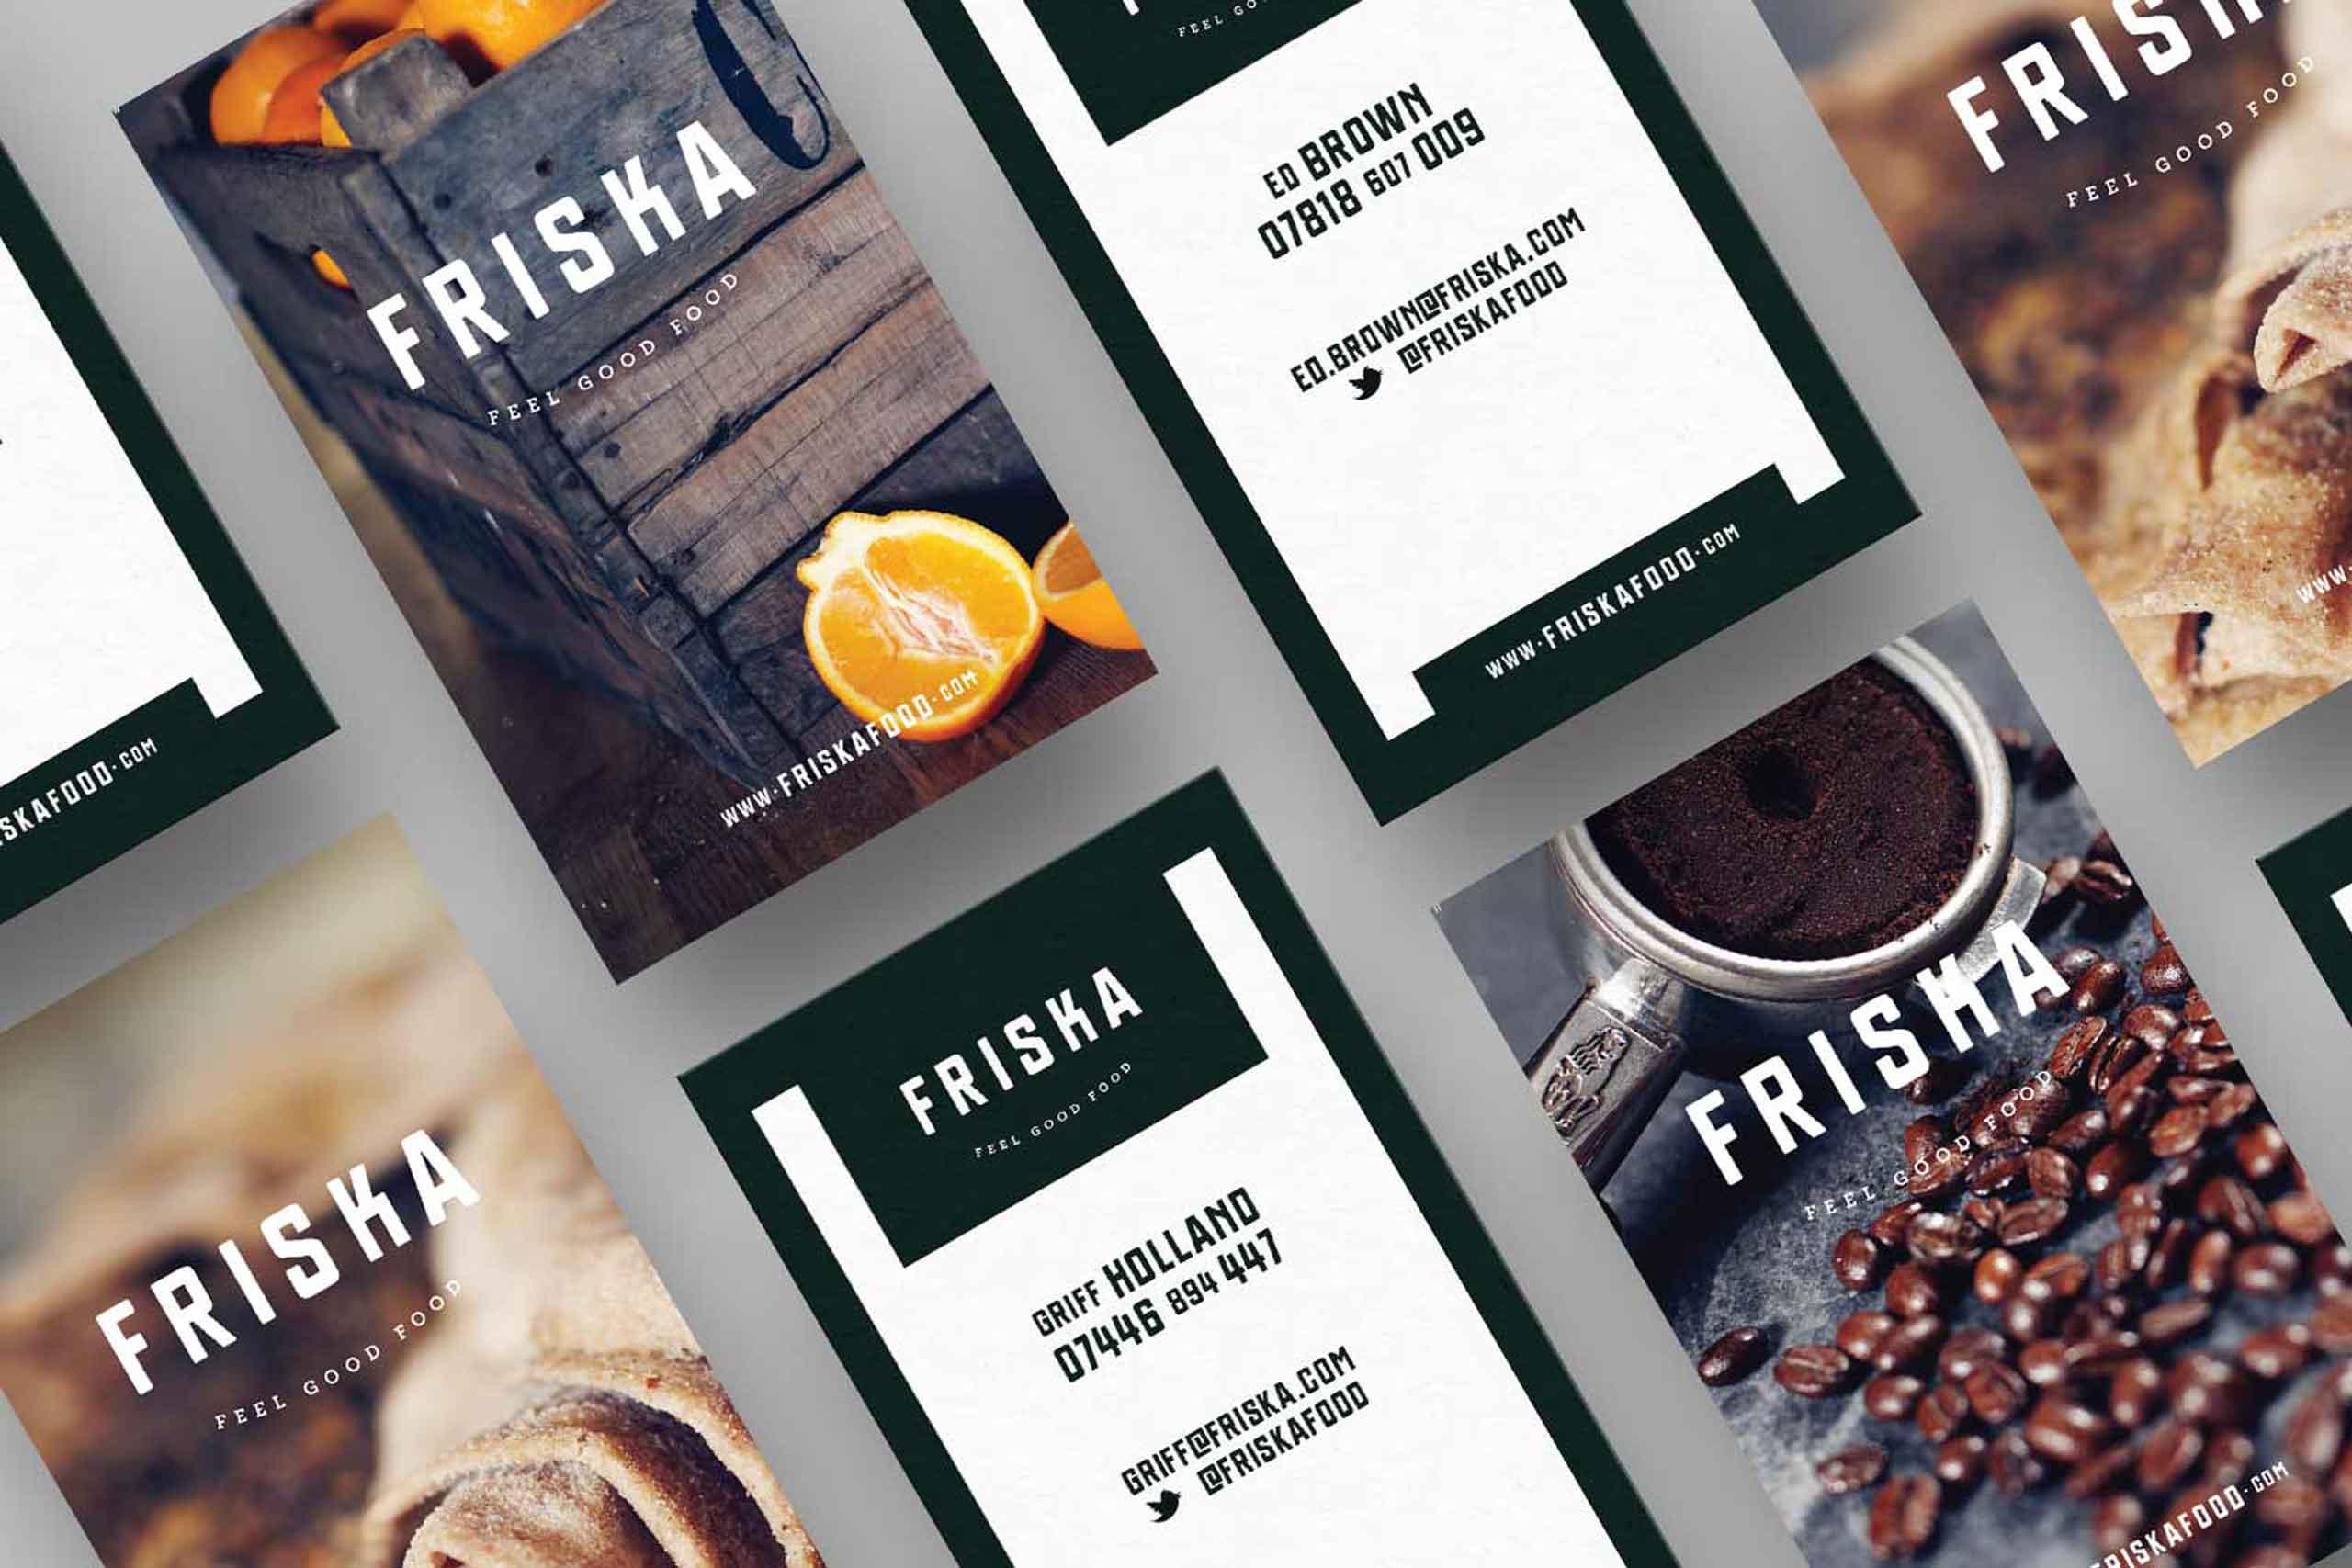 business cards for friska bristol